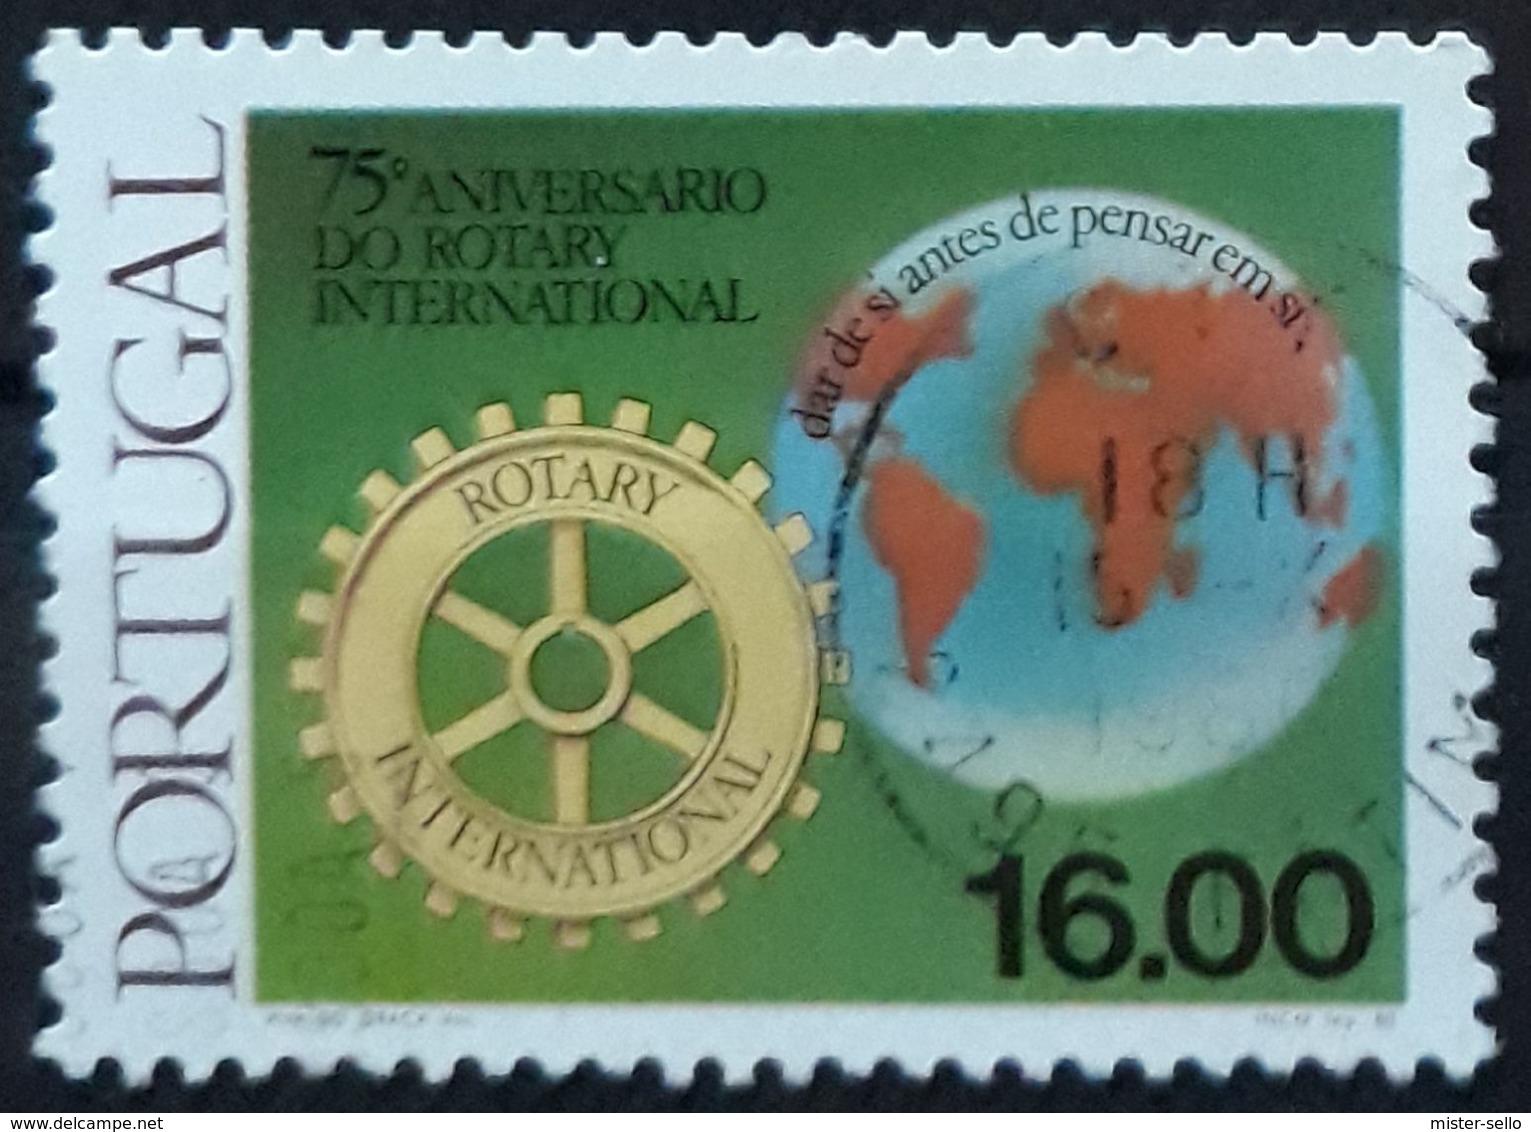 PORTUGAL 1980 The 75th Anniversary Of Rotary International. USADO - USED. - 1910-... République